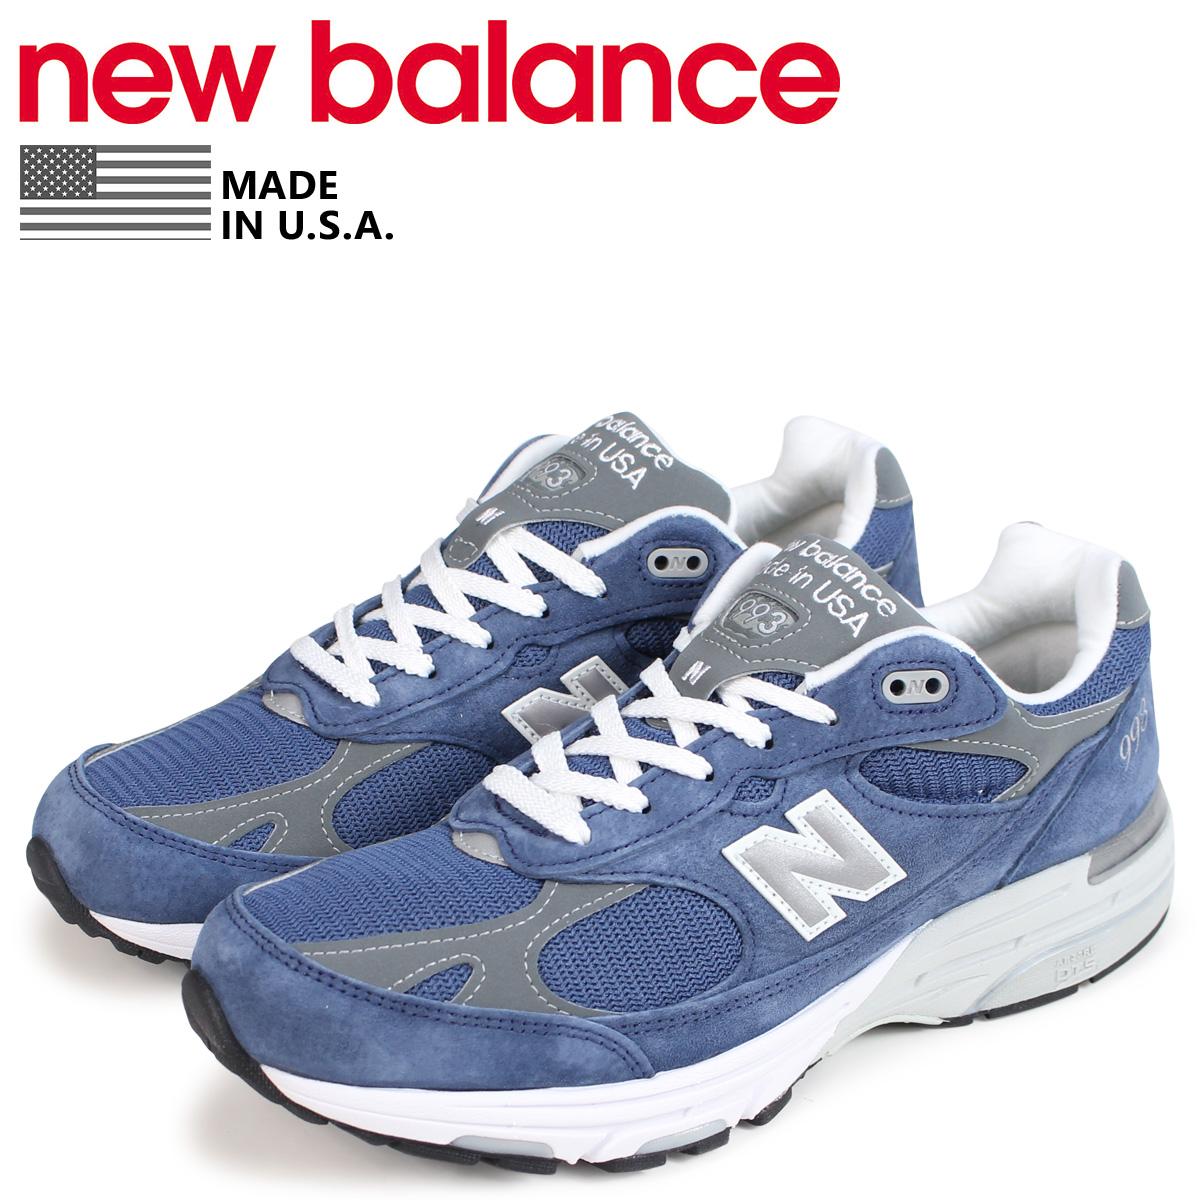 new balance usa 993